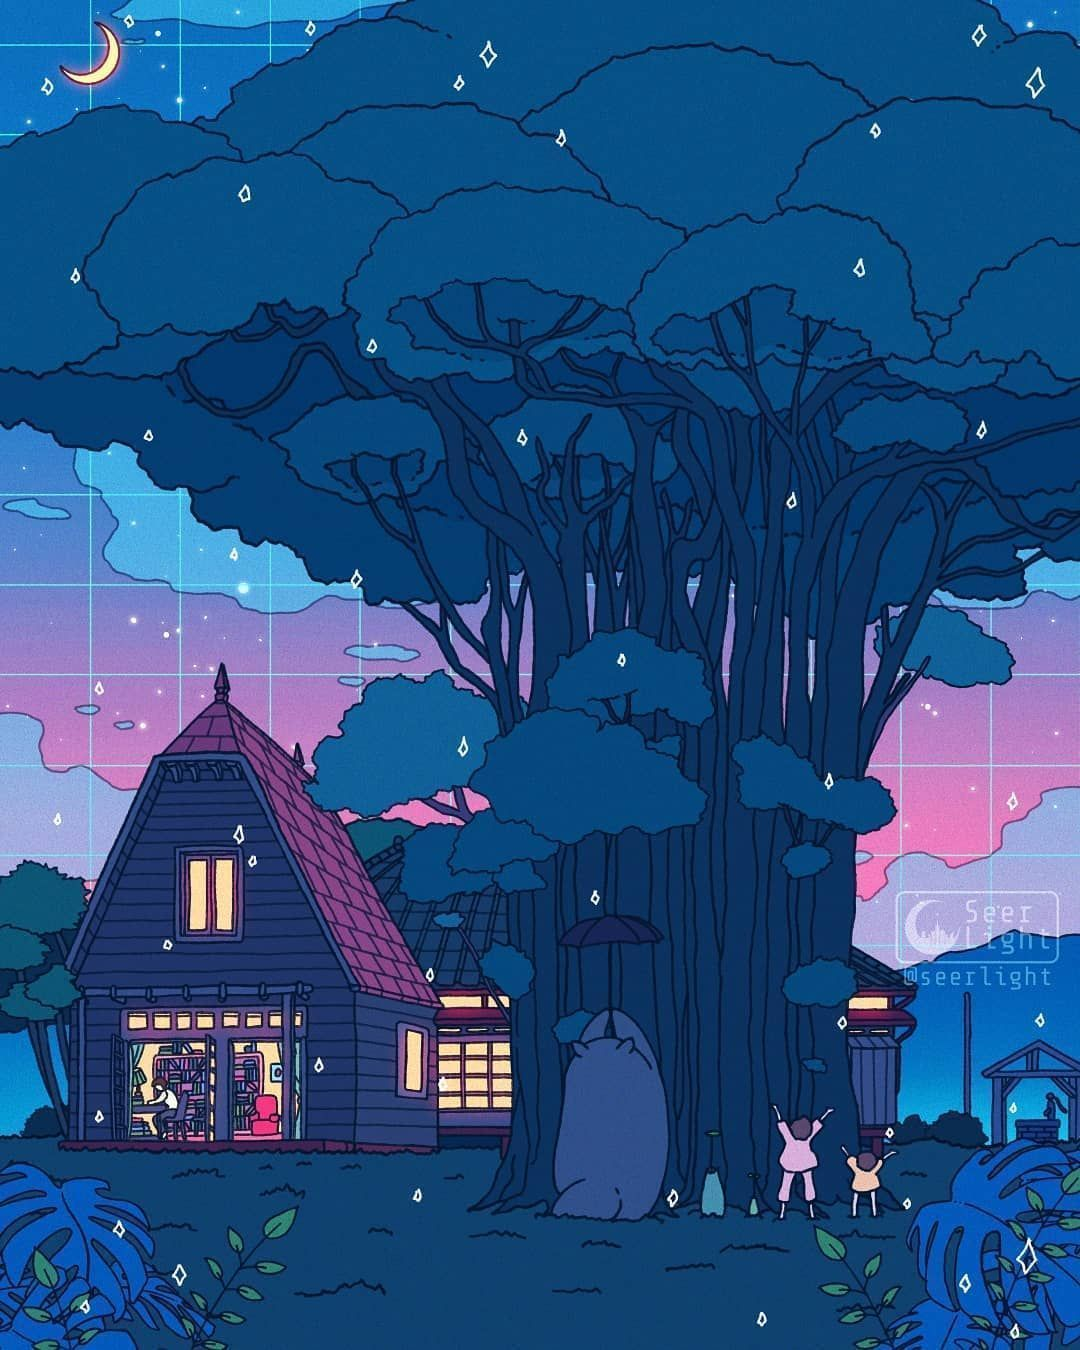 Wallpapers Ipad Wallpapers Ipad Ghibli Artwork Studio Ghibli Movies Ghibli Art